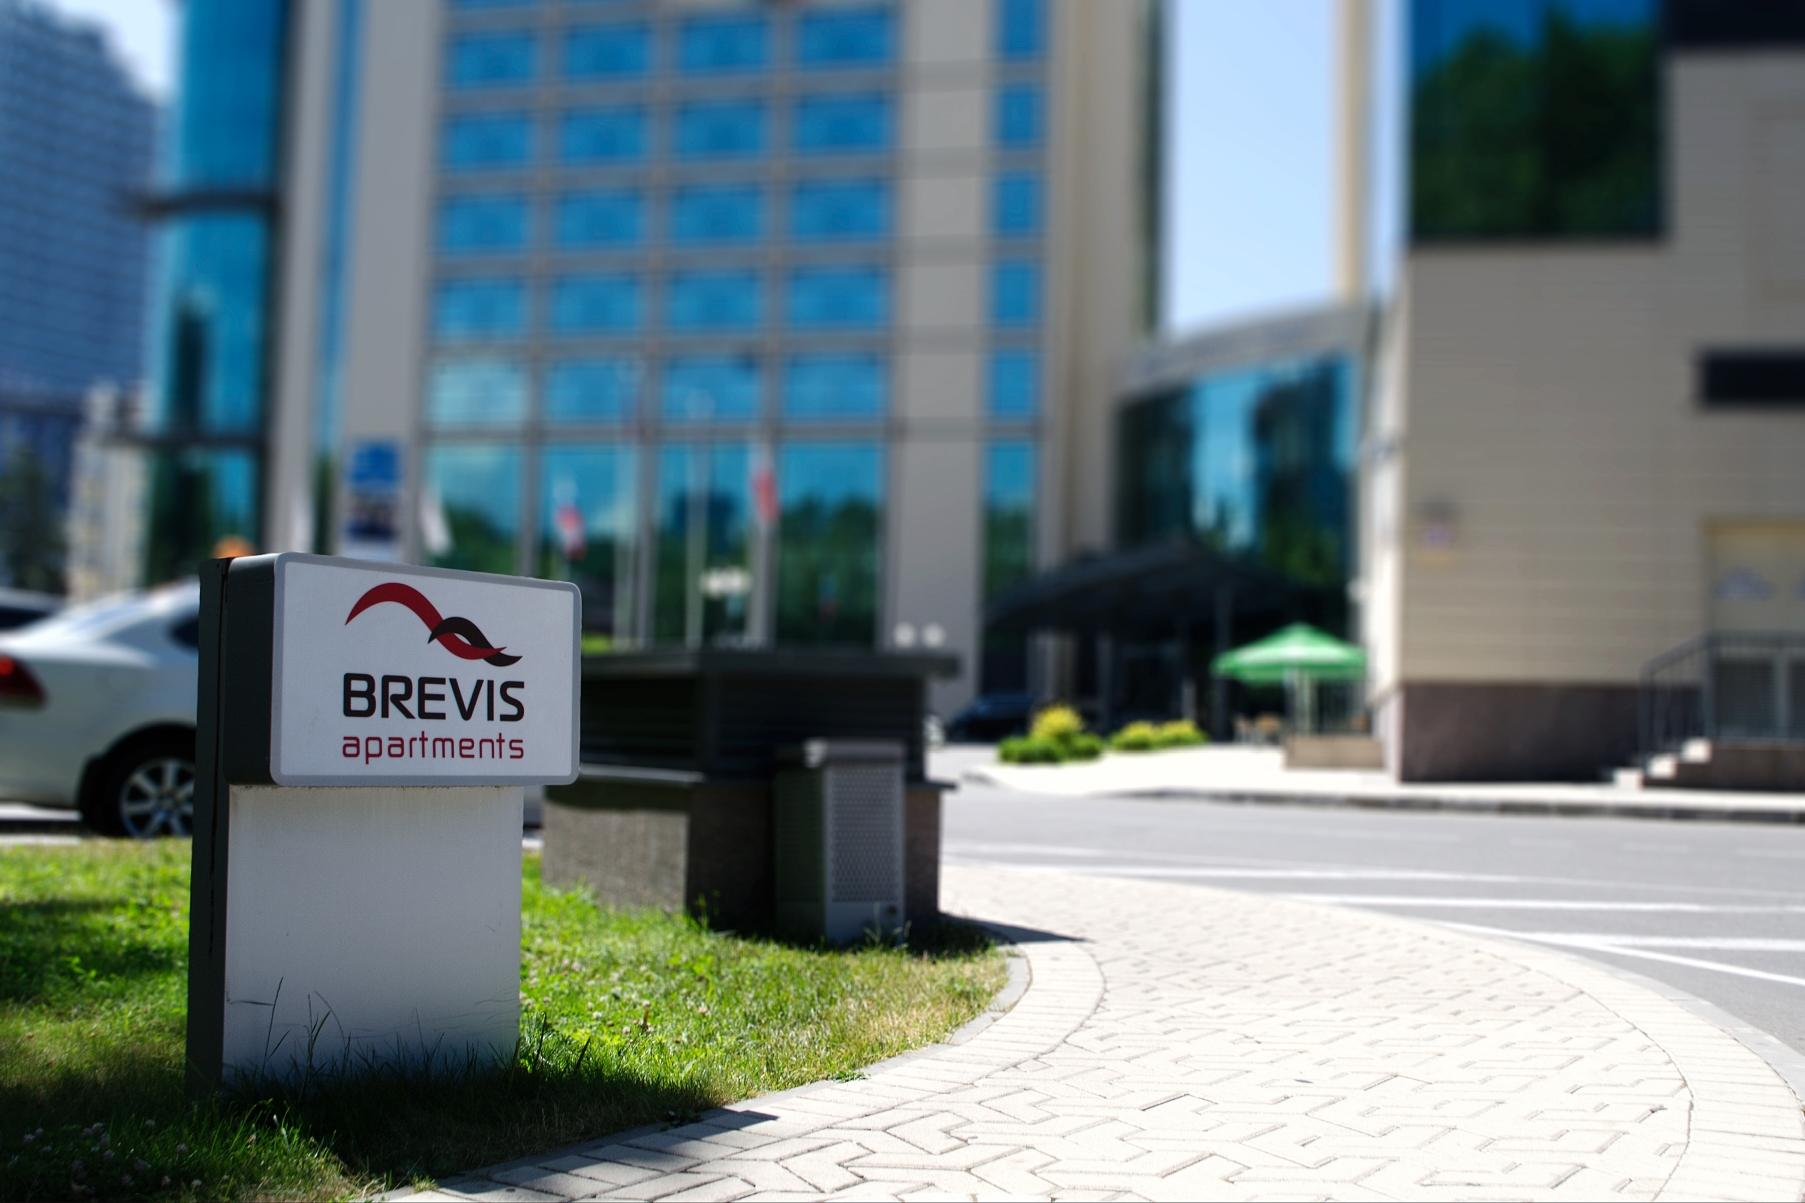 Brevis apartments Reviews